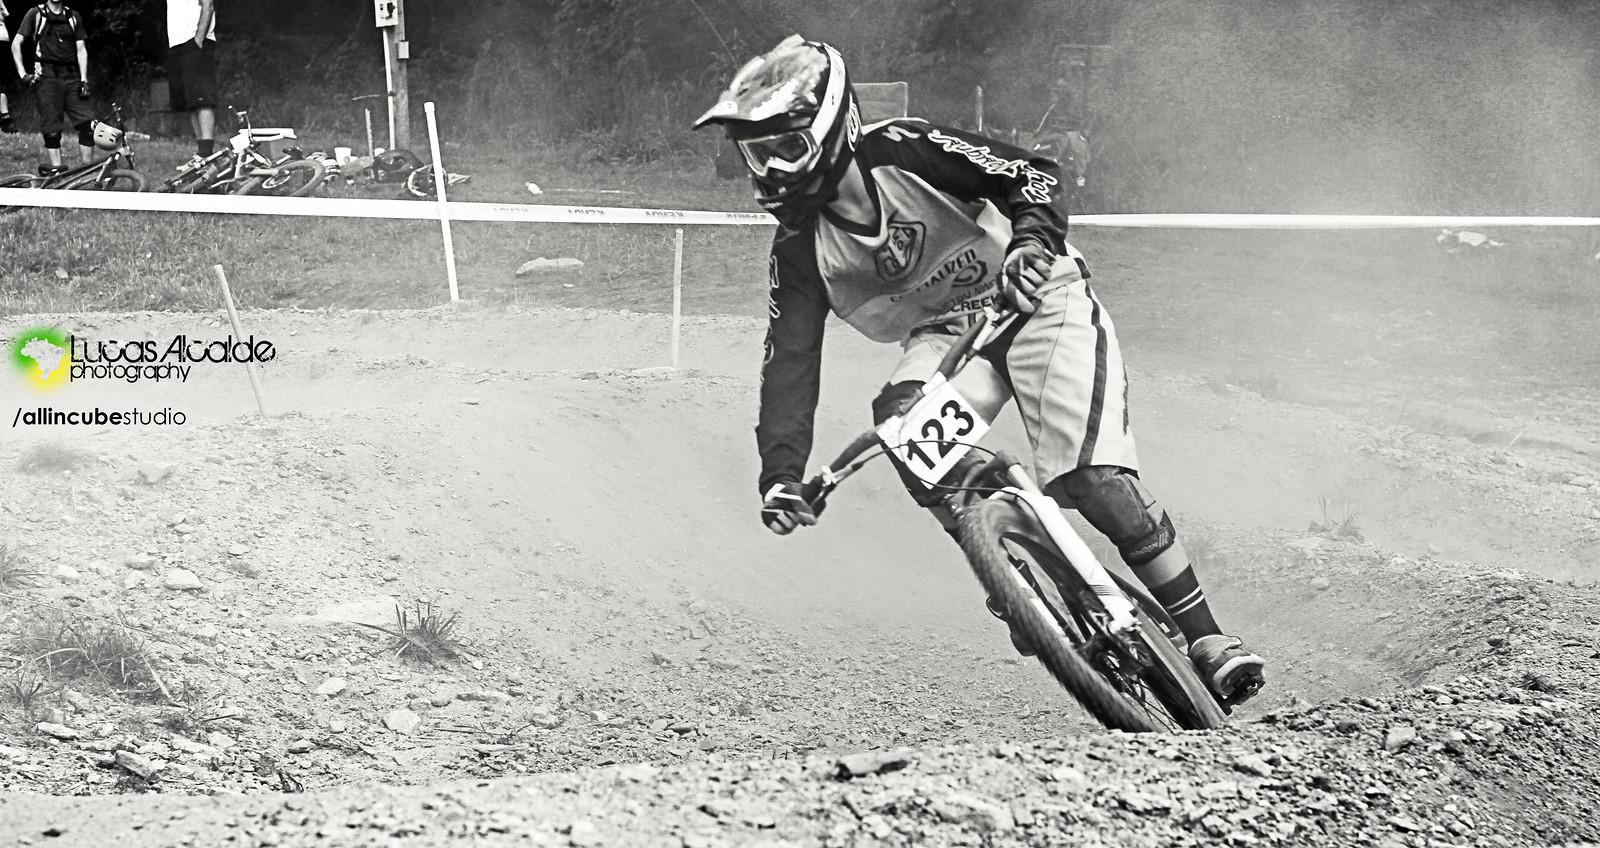 Dusty!!! - Lucas_Alcalde - Mountain Biking Pictures - Vital MTB